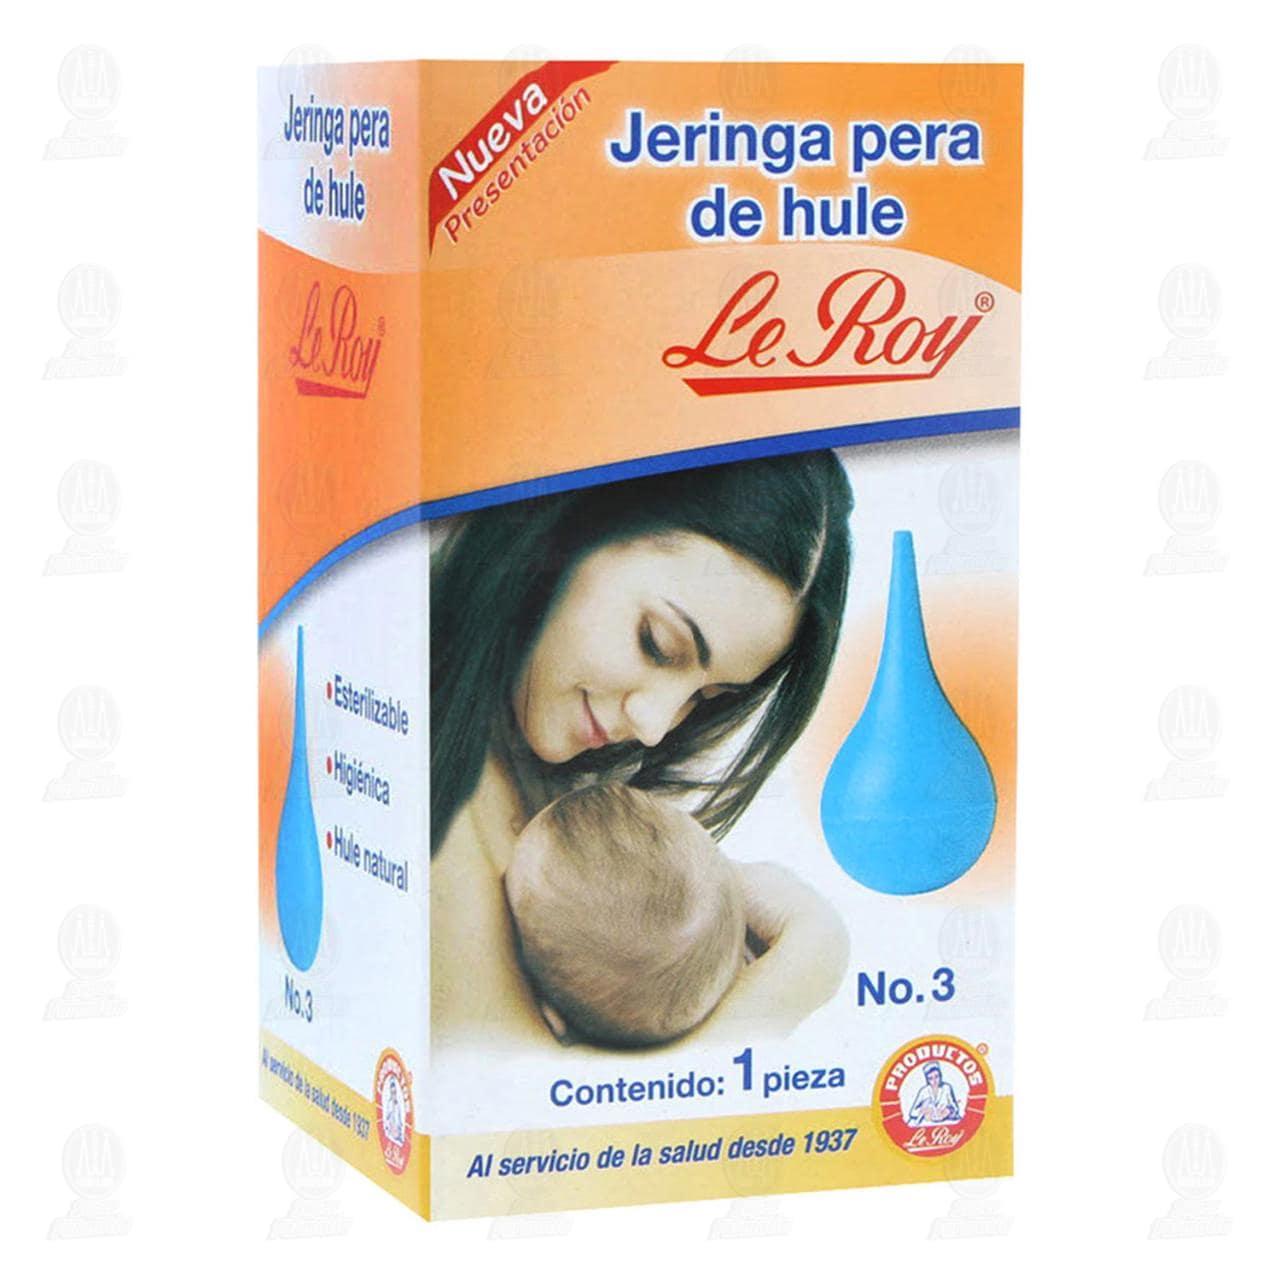 Comprar Jeringa Pera Le Roy de Hule No.3 1pz en Farmacias Guadalajara